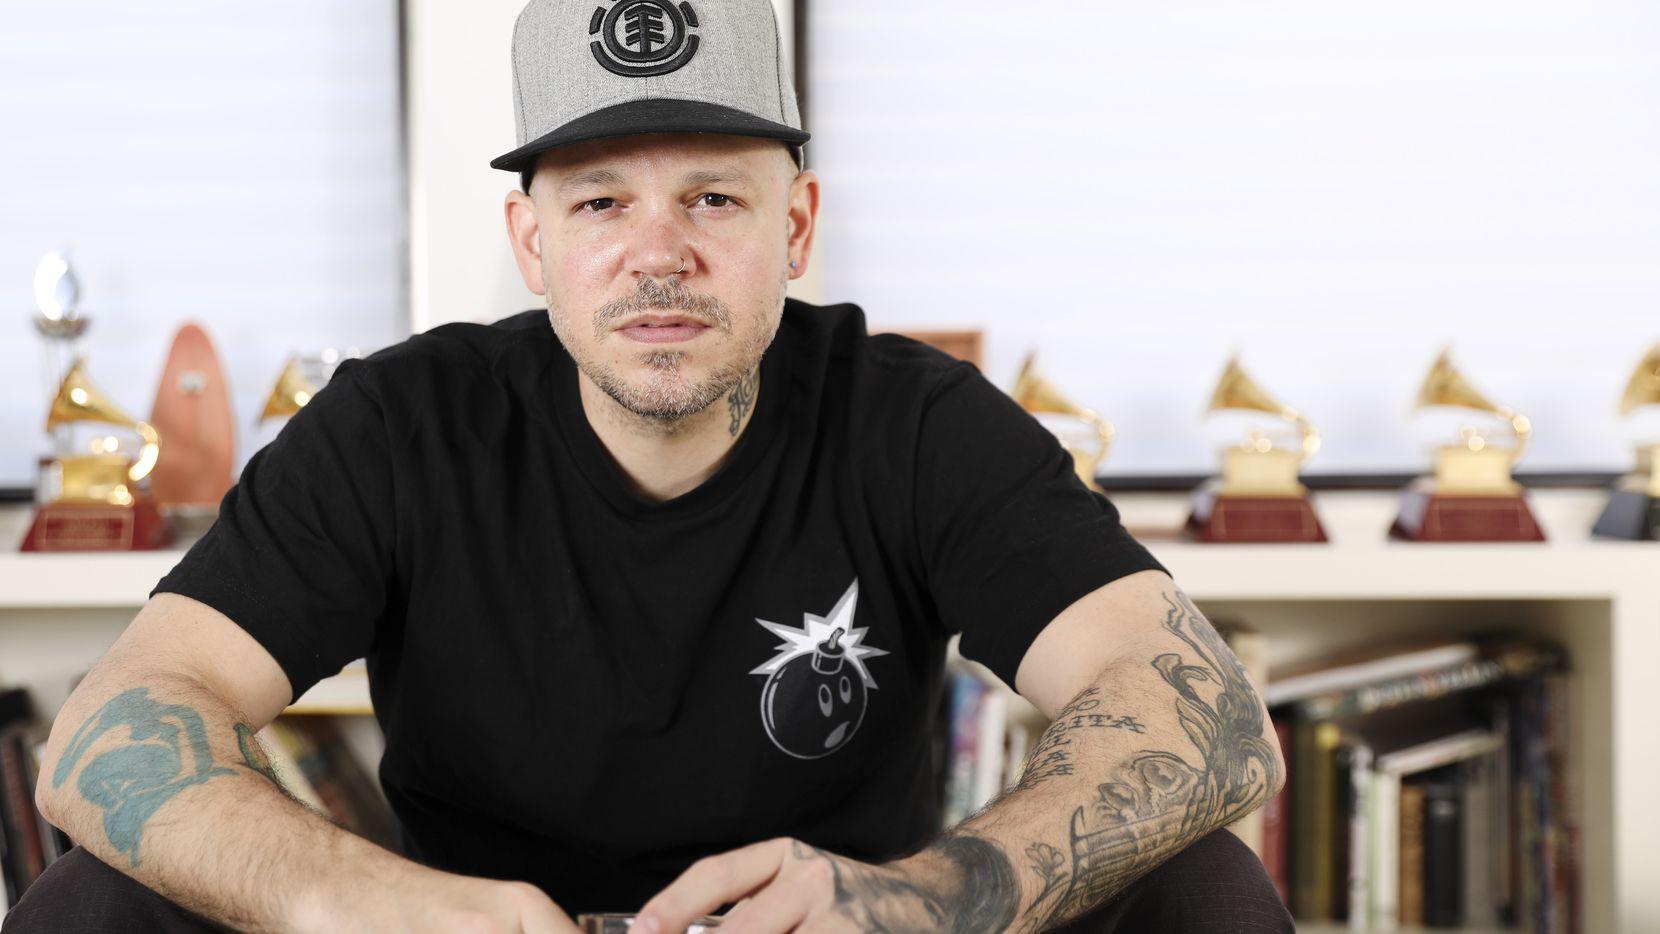 René Pérez Joglar, conocido profesionalmente como Residente, en su casa de Nueva York.